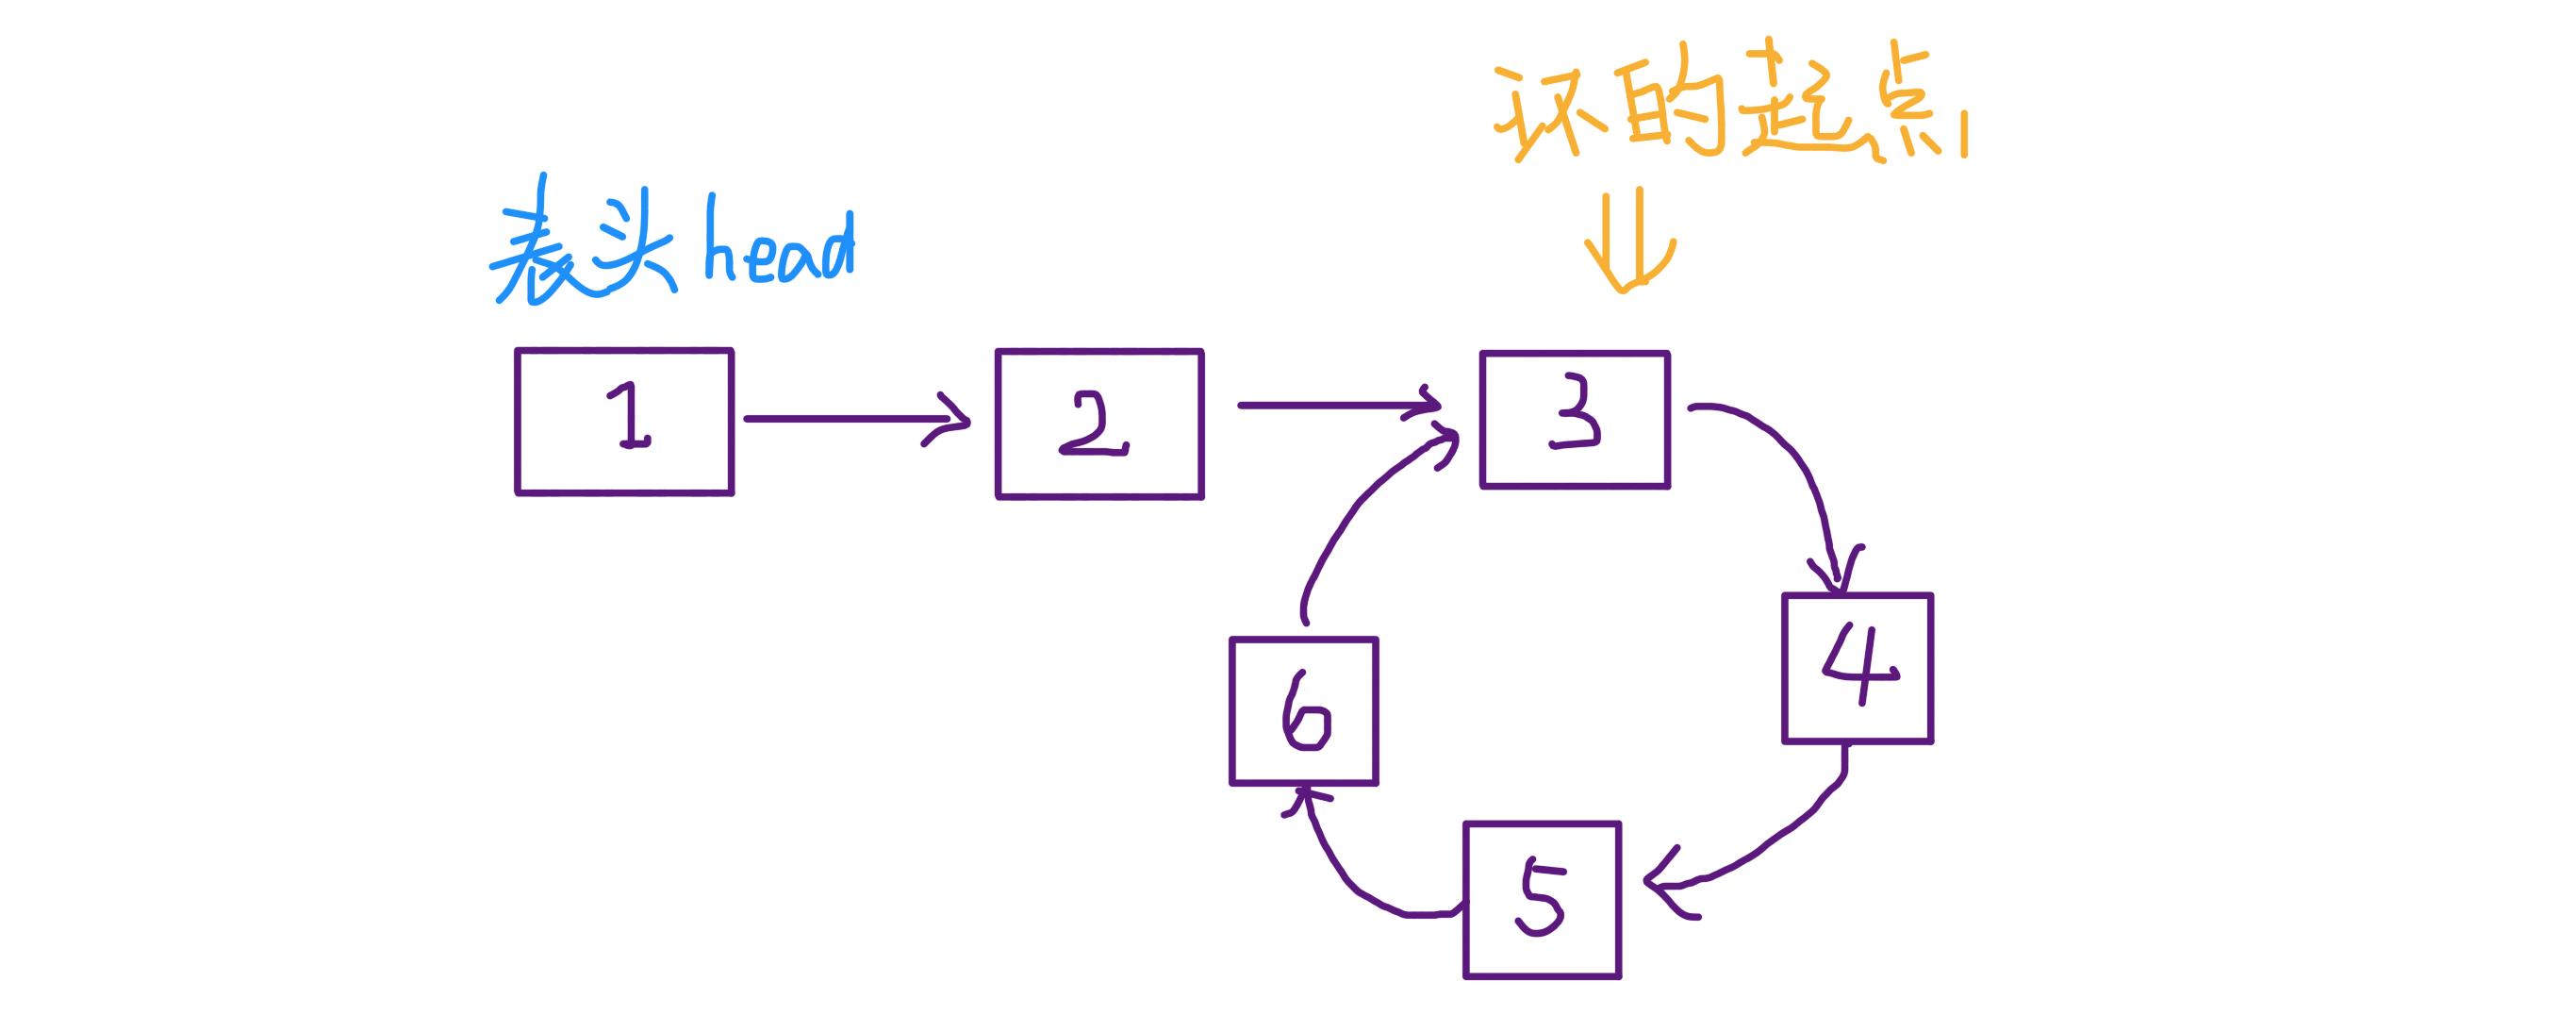 LC算法技巧总结(二):双指针和滑动窗口技巧